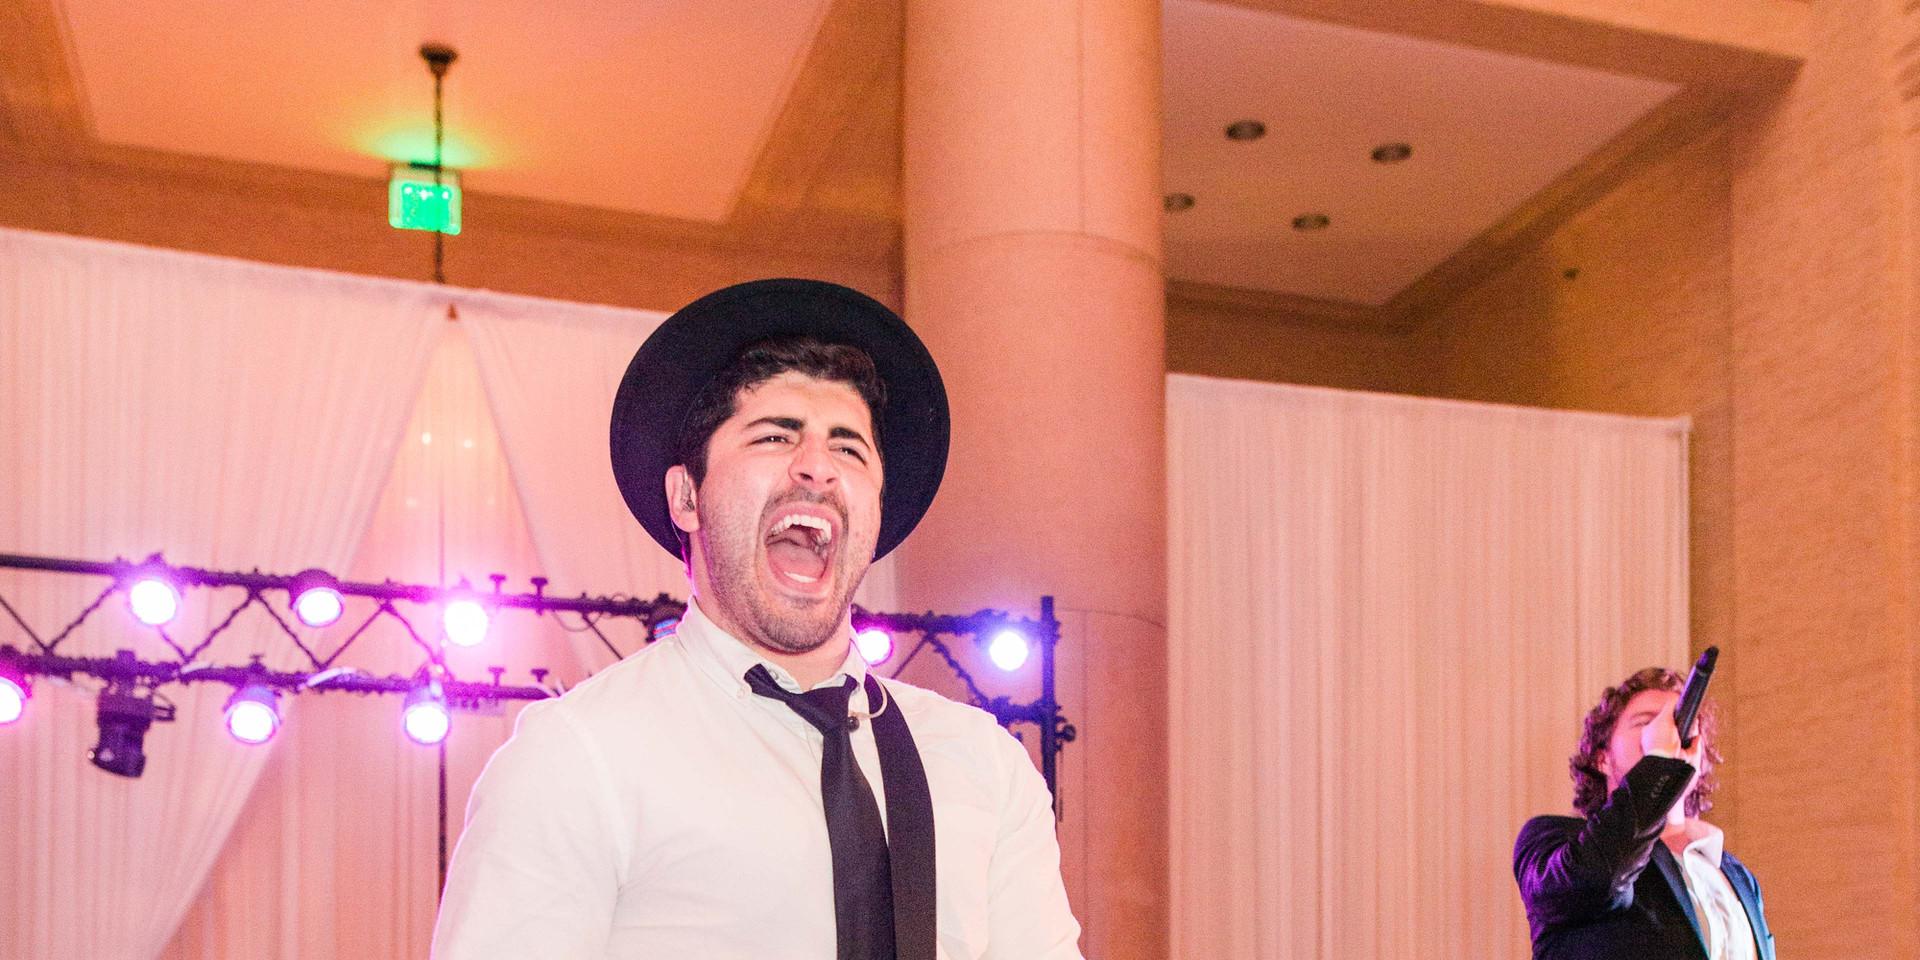 Marina-Eugene-Wedding-by-JBJ-Pictures-47